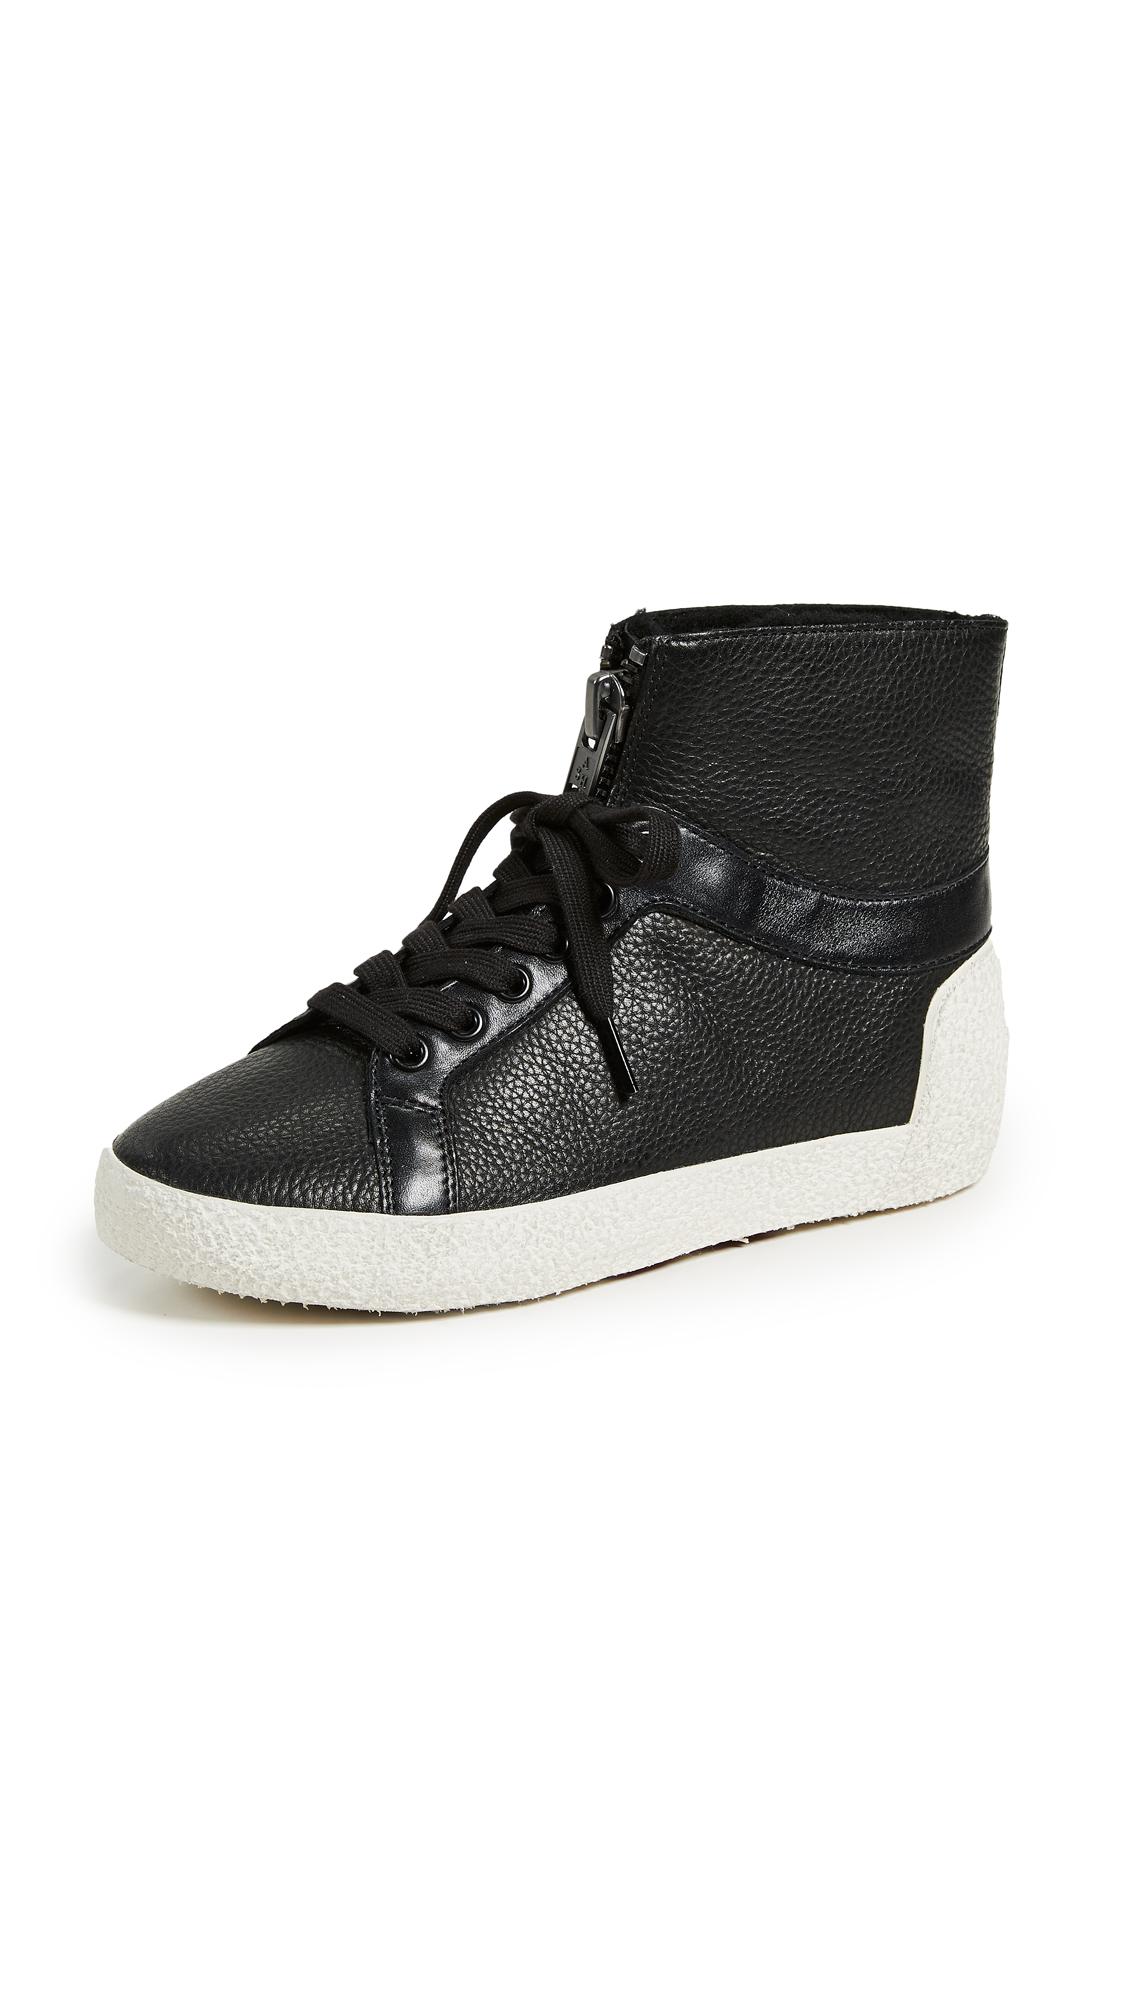 Ash Nomad Sneakers - Black/Black